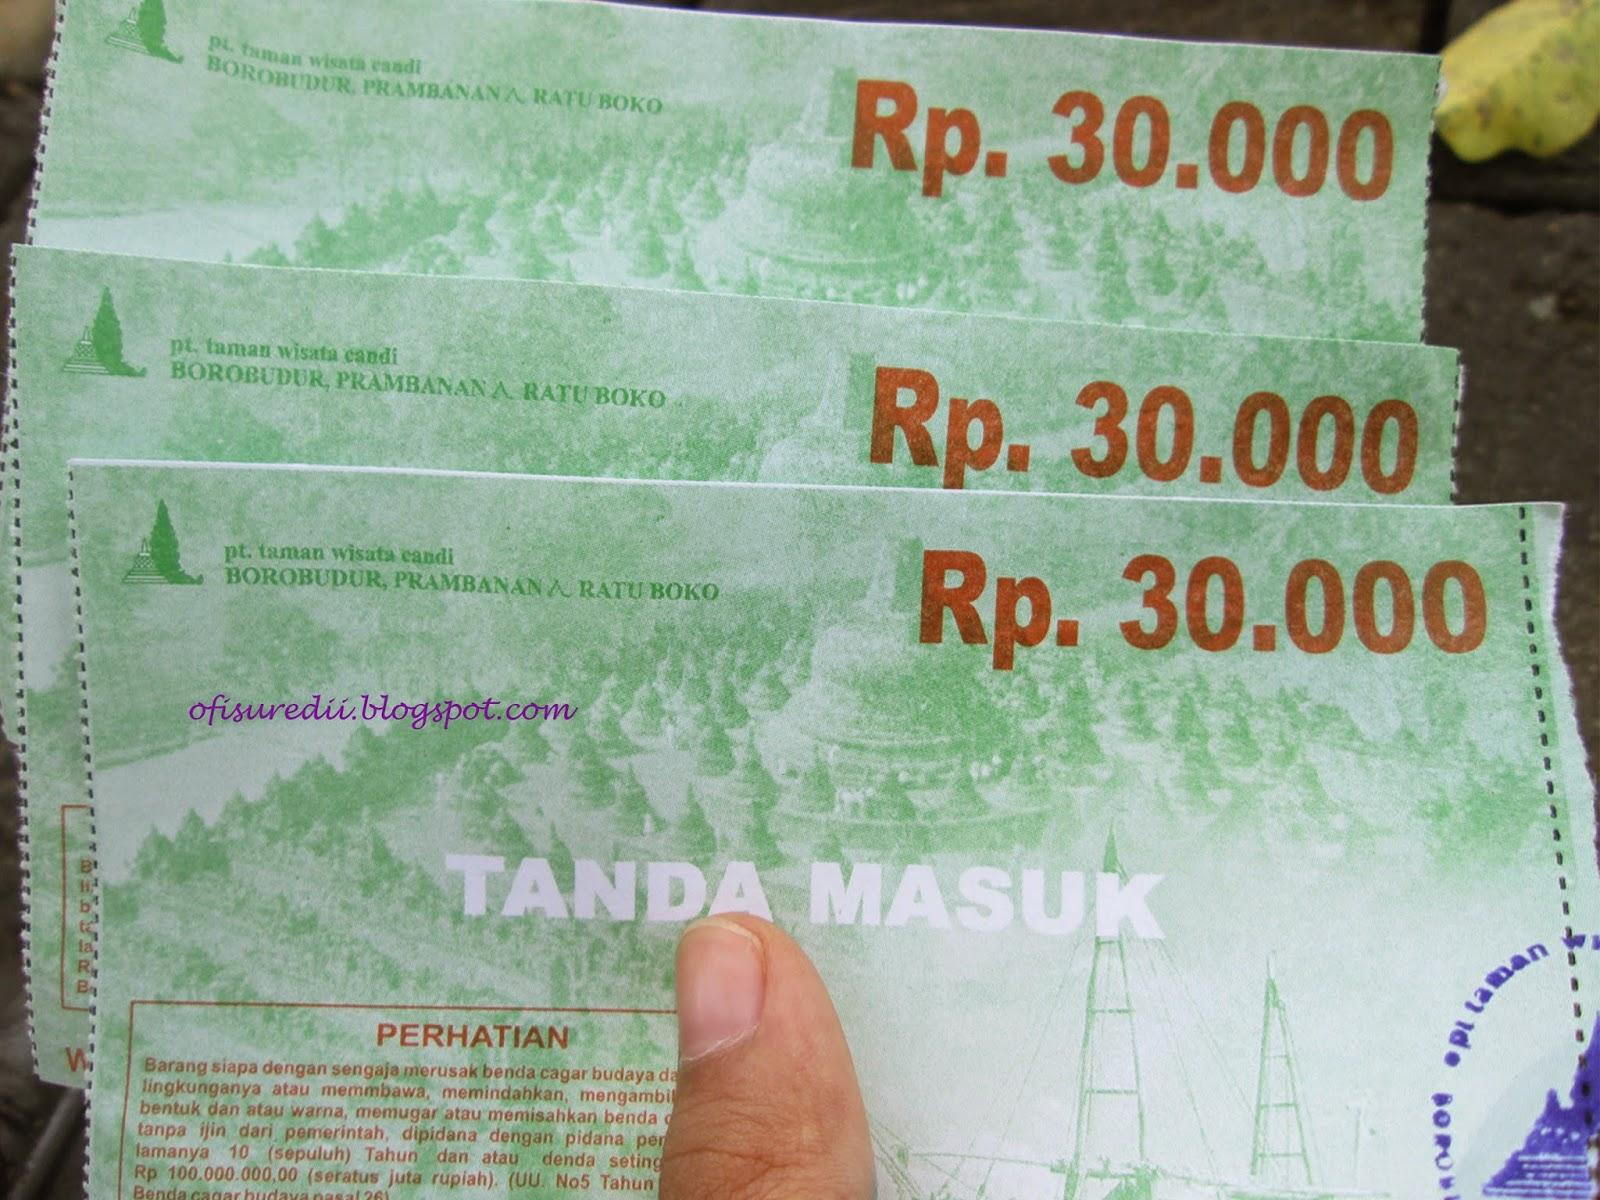 Berkunjung Ke Candi Borobudur Ofisu Redii